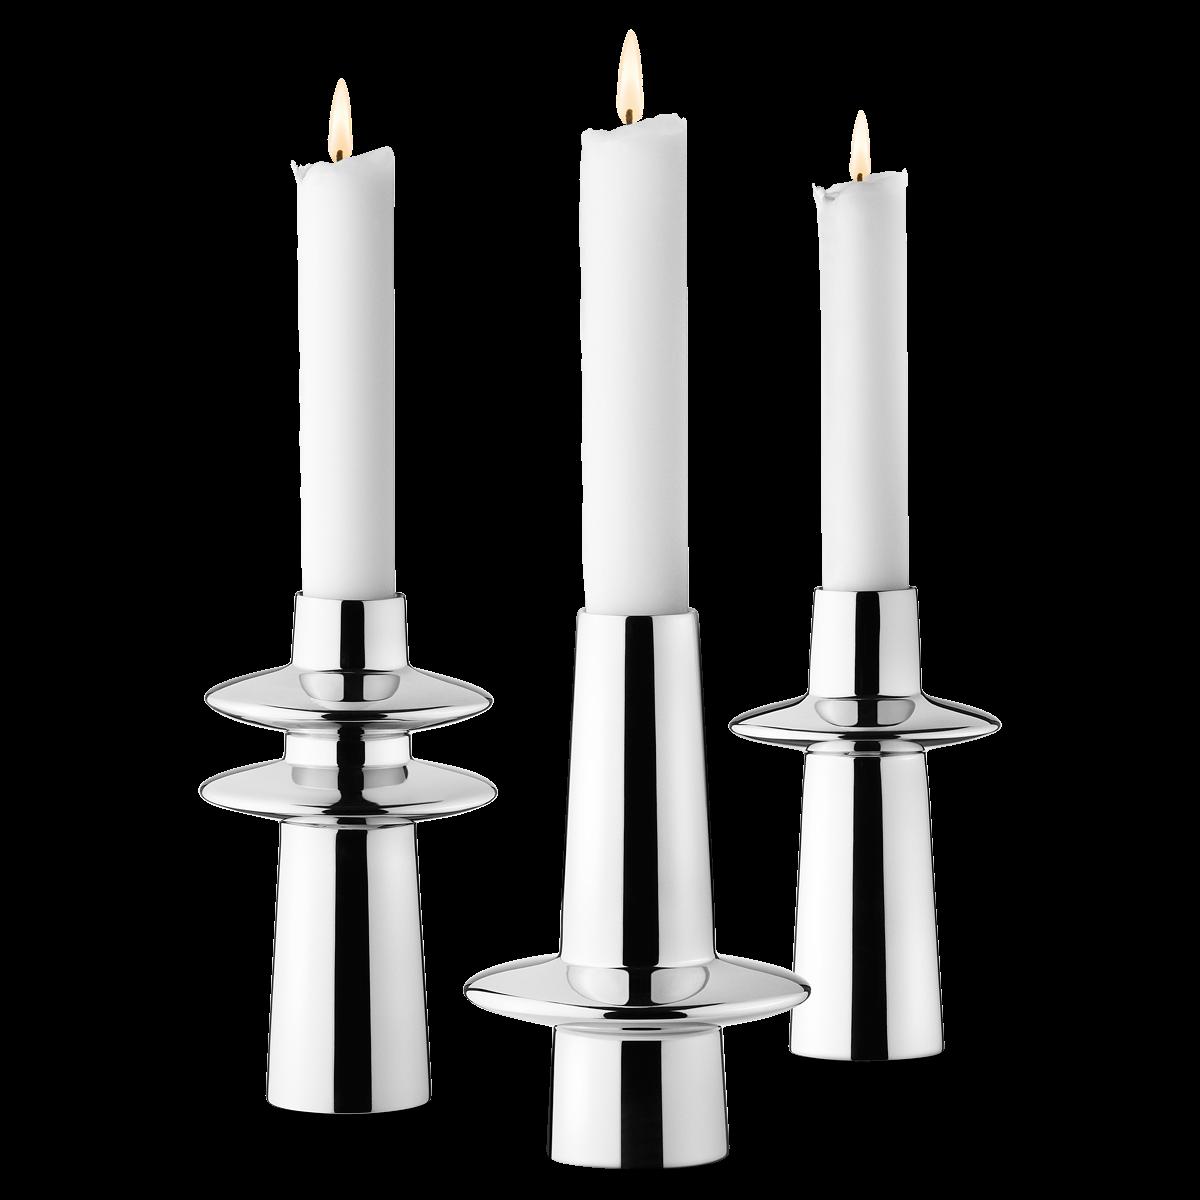 Ellipse Candleholders 3 Pcs Candle Holders Fireplace Candle